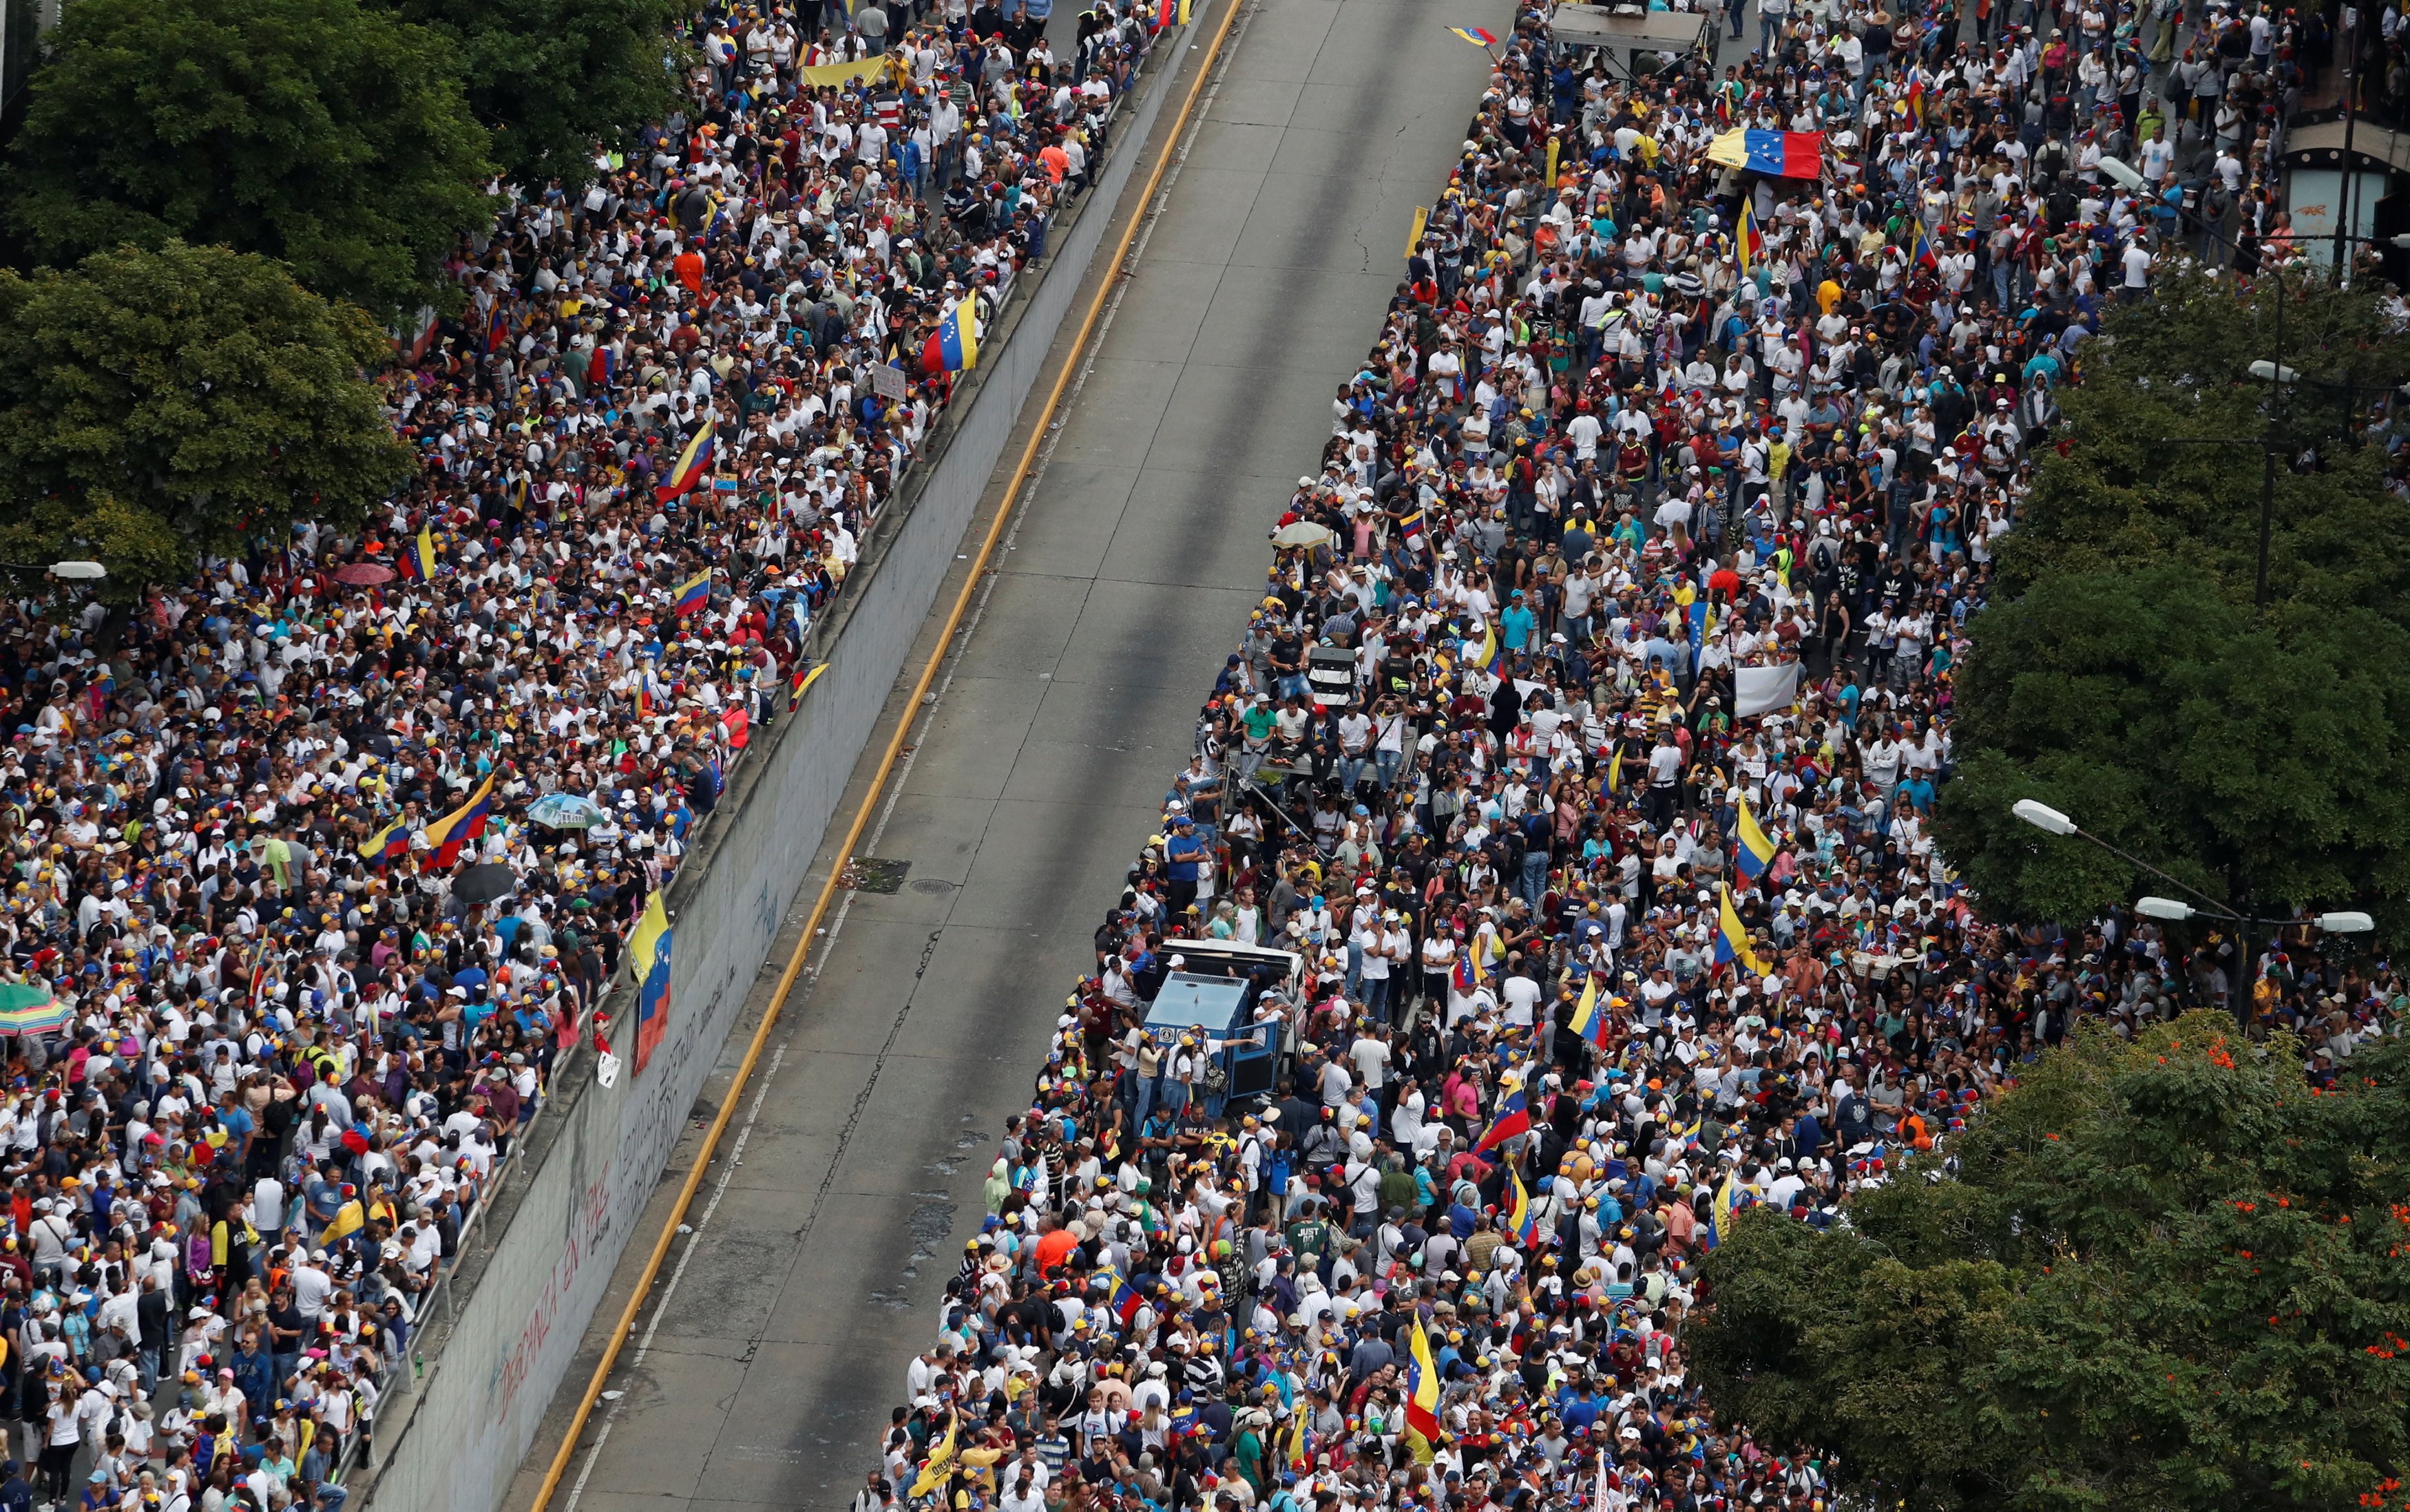 El centro de Caracas se llenó poco después de la hora de convocatoria